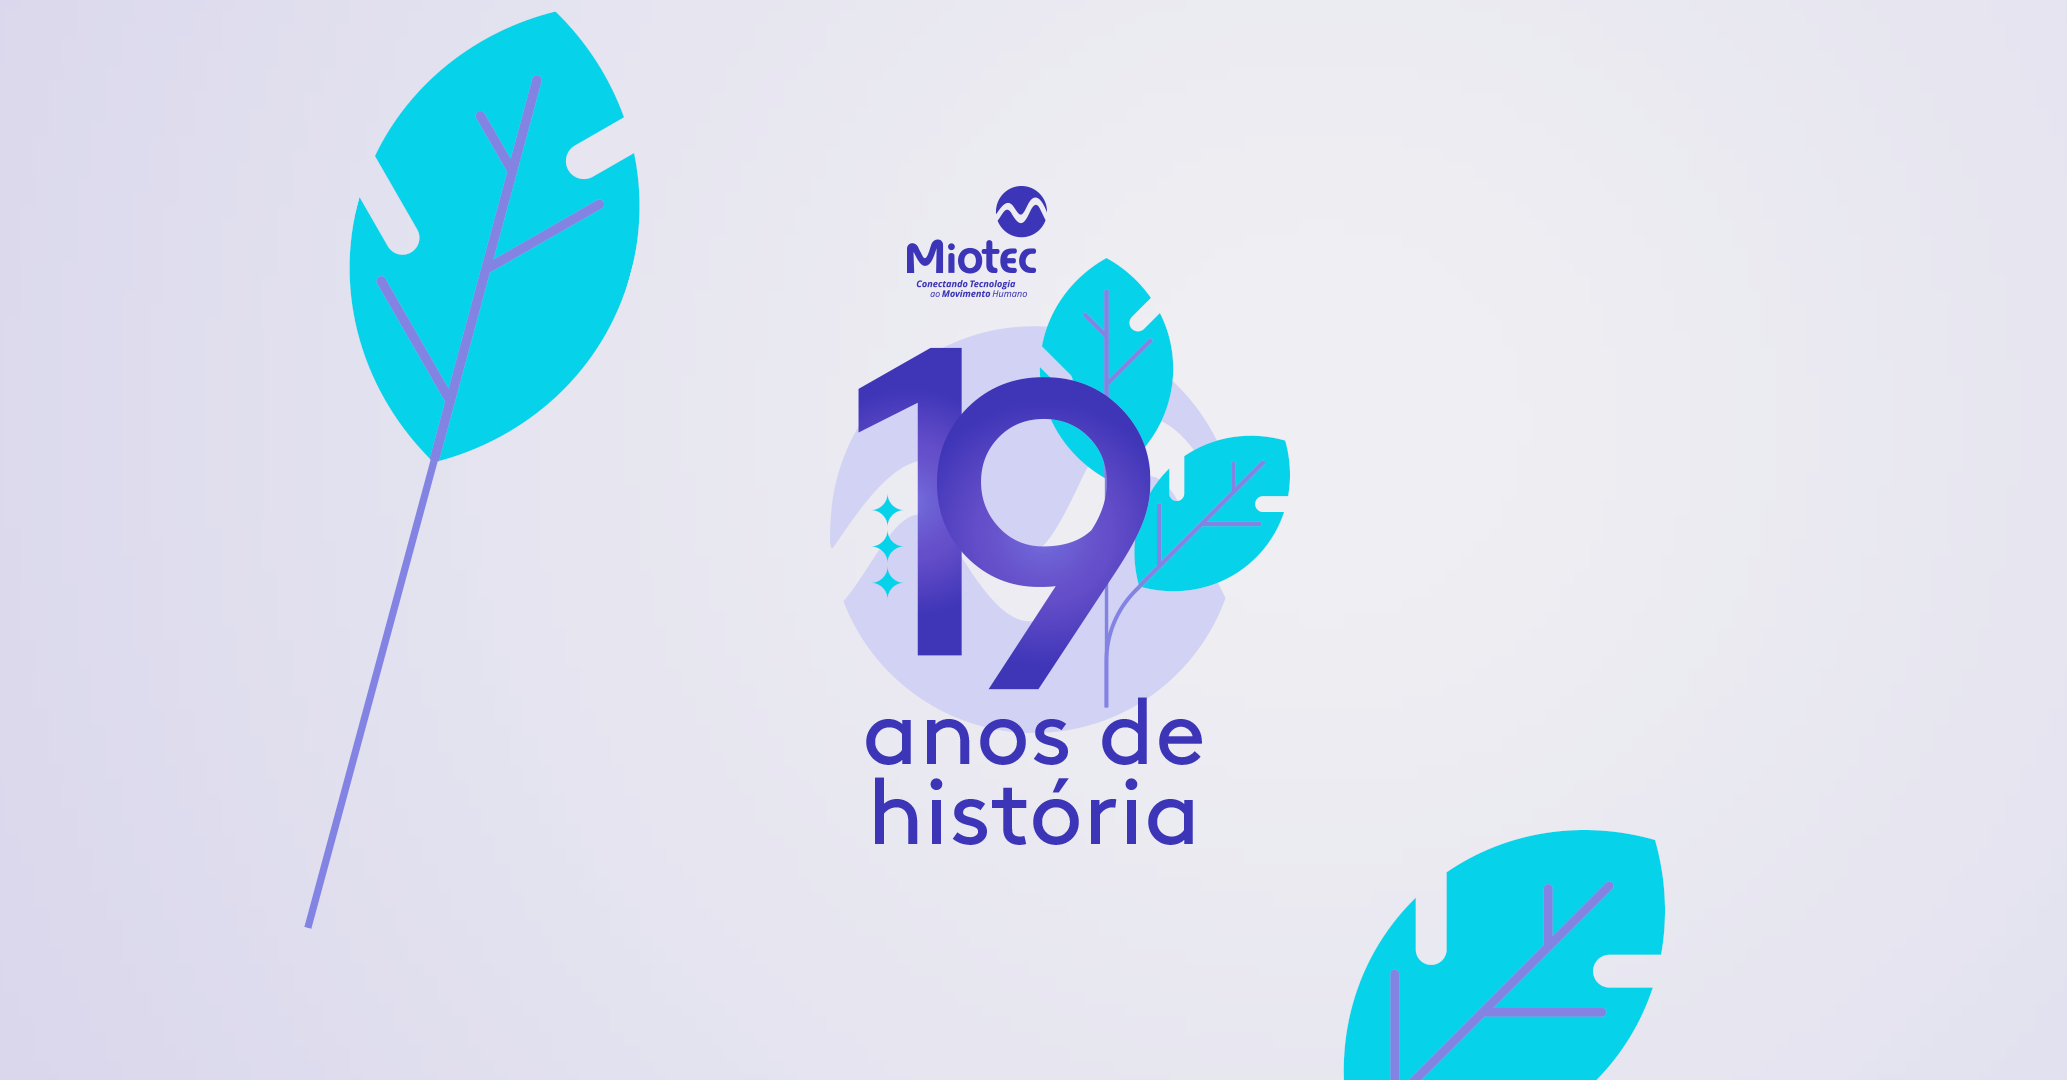 Miotec: há 19 anos conectando tecnologia ao movimento humano